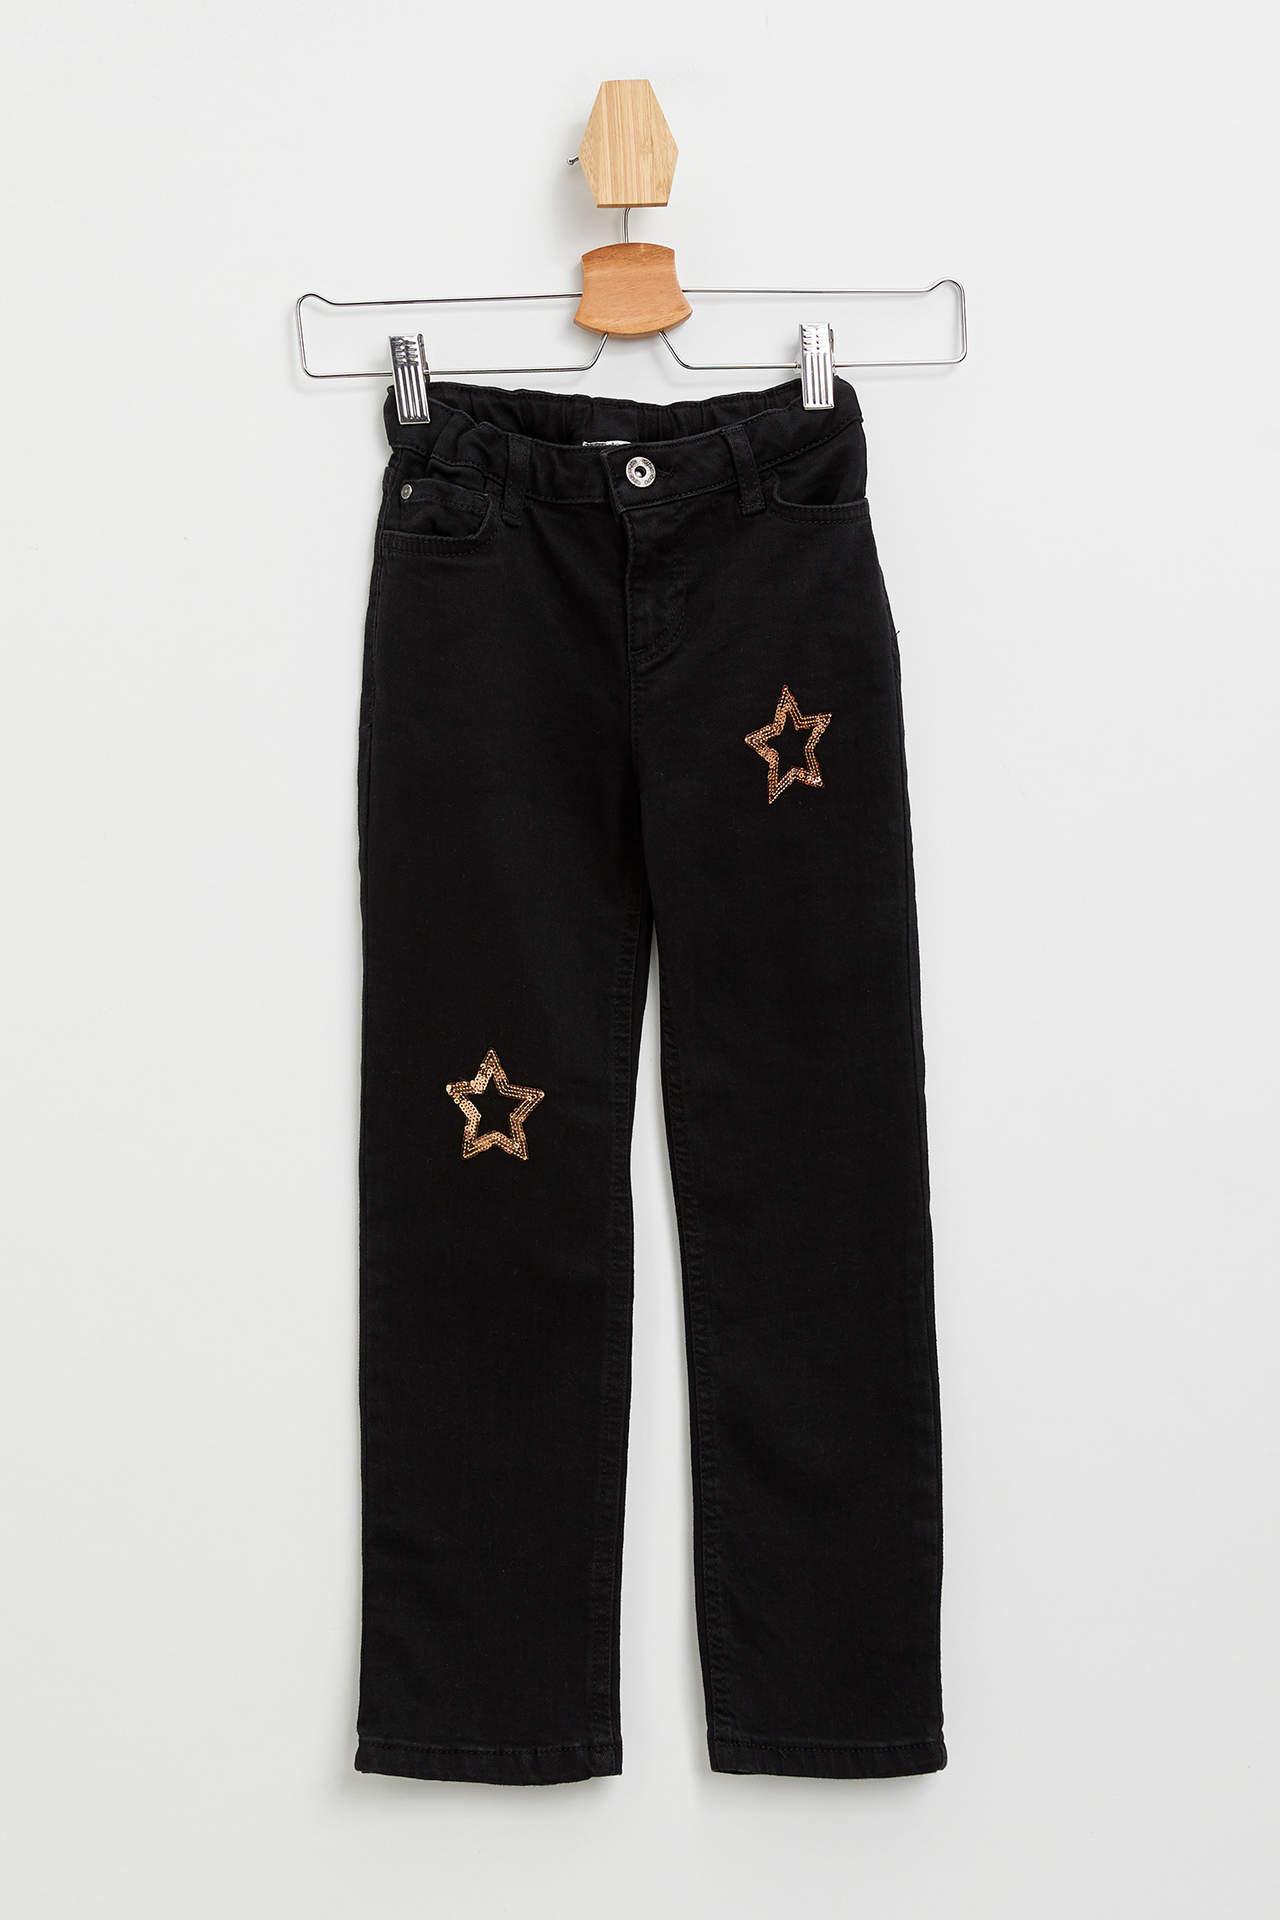 DeFacto Kız Çocuk Slim Fit Jean Pantolon Gri female